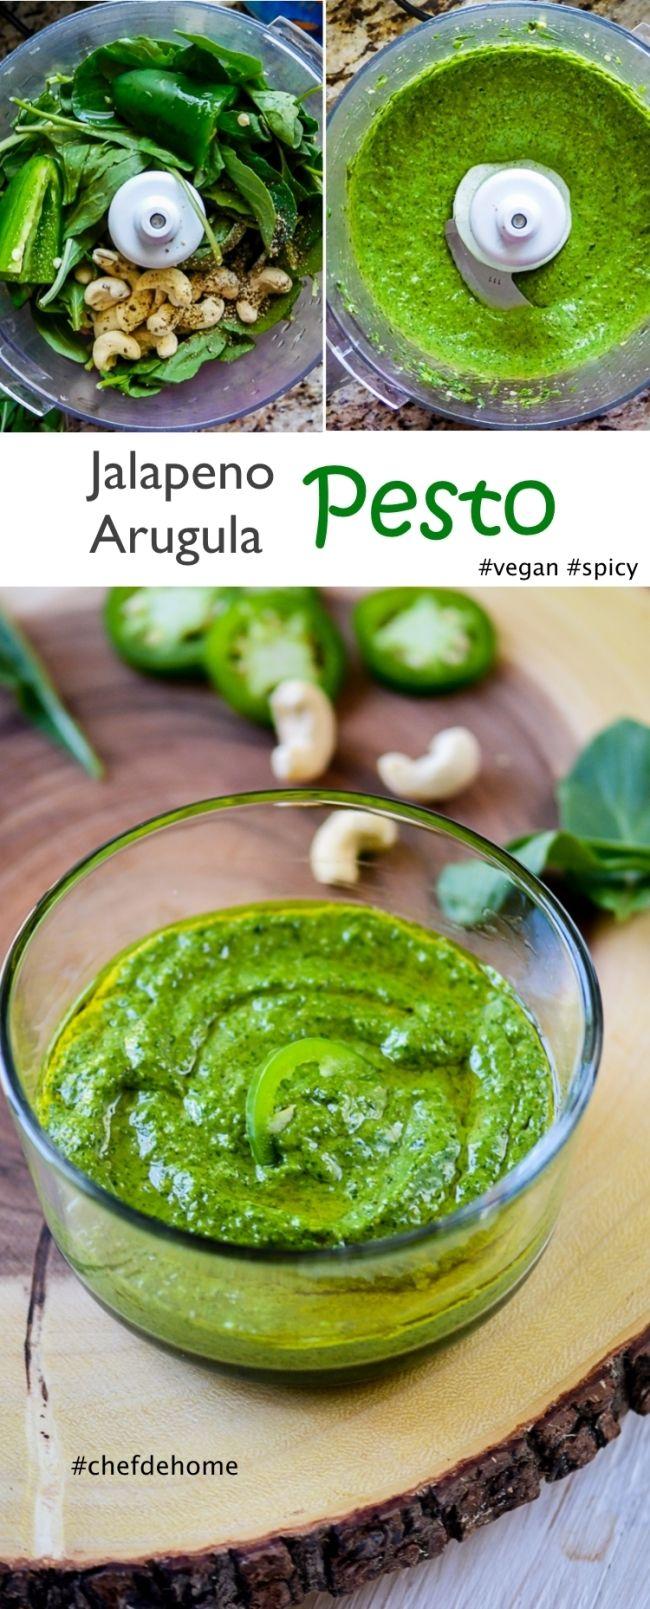 Spicy Vegan Green Pesto Pasta Sauce | Jalapeno Arugula Pesto Sauce | chefdehome.com